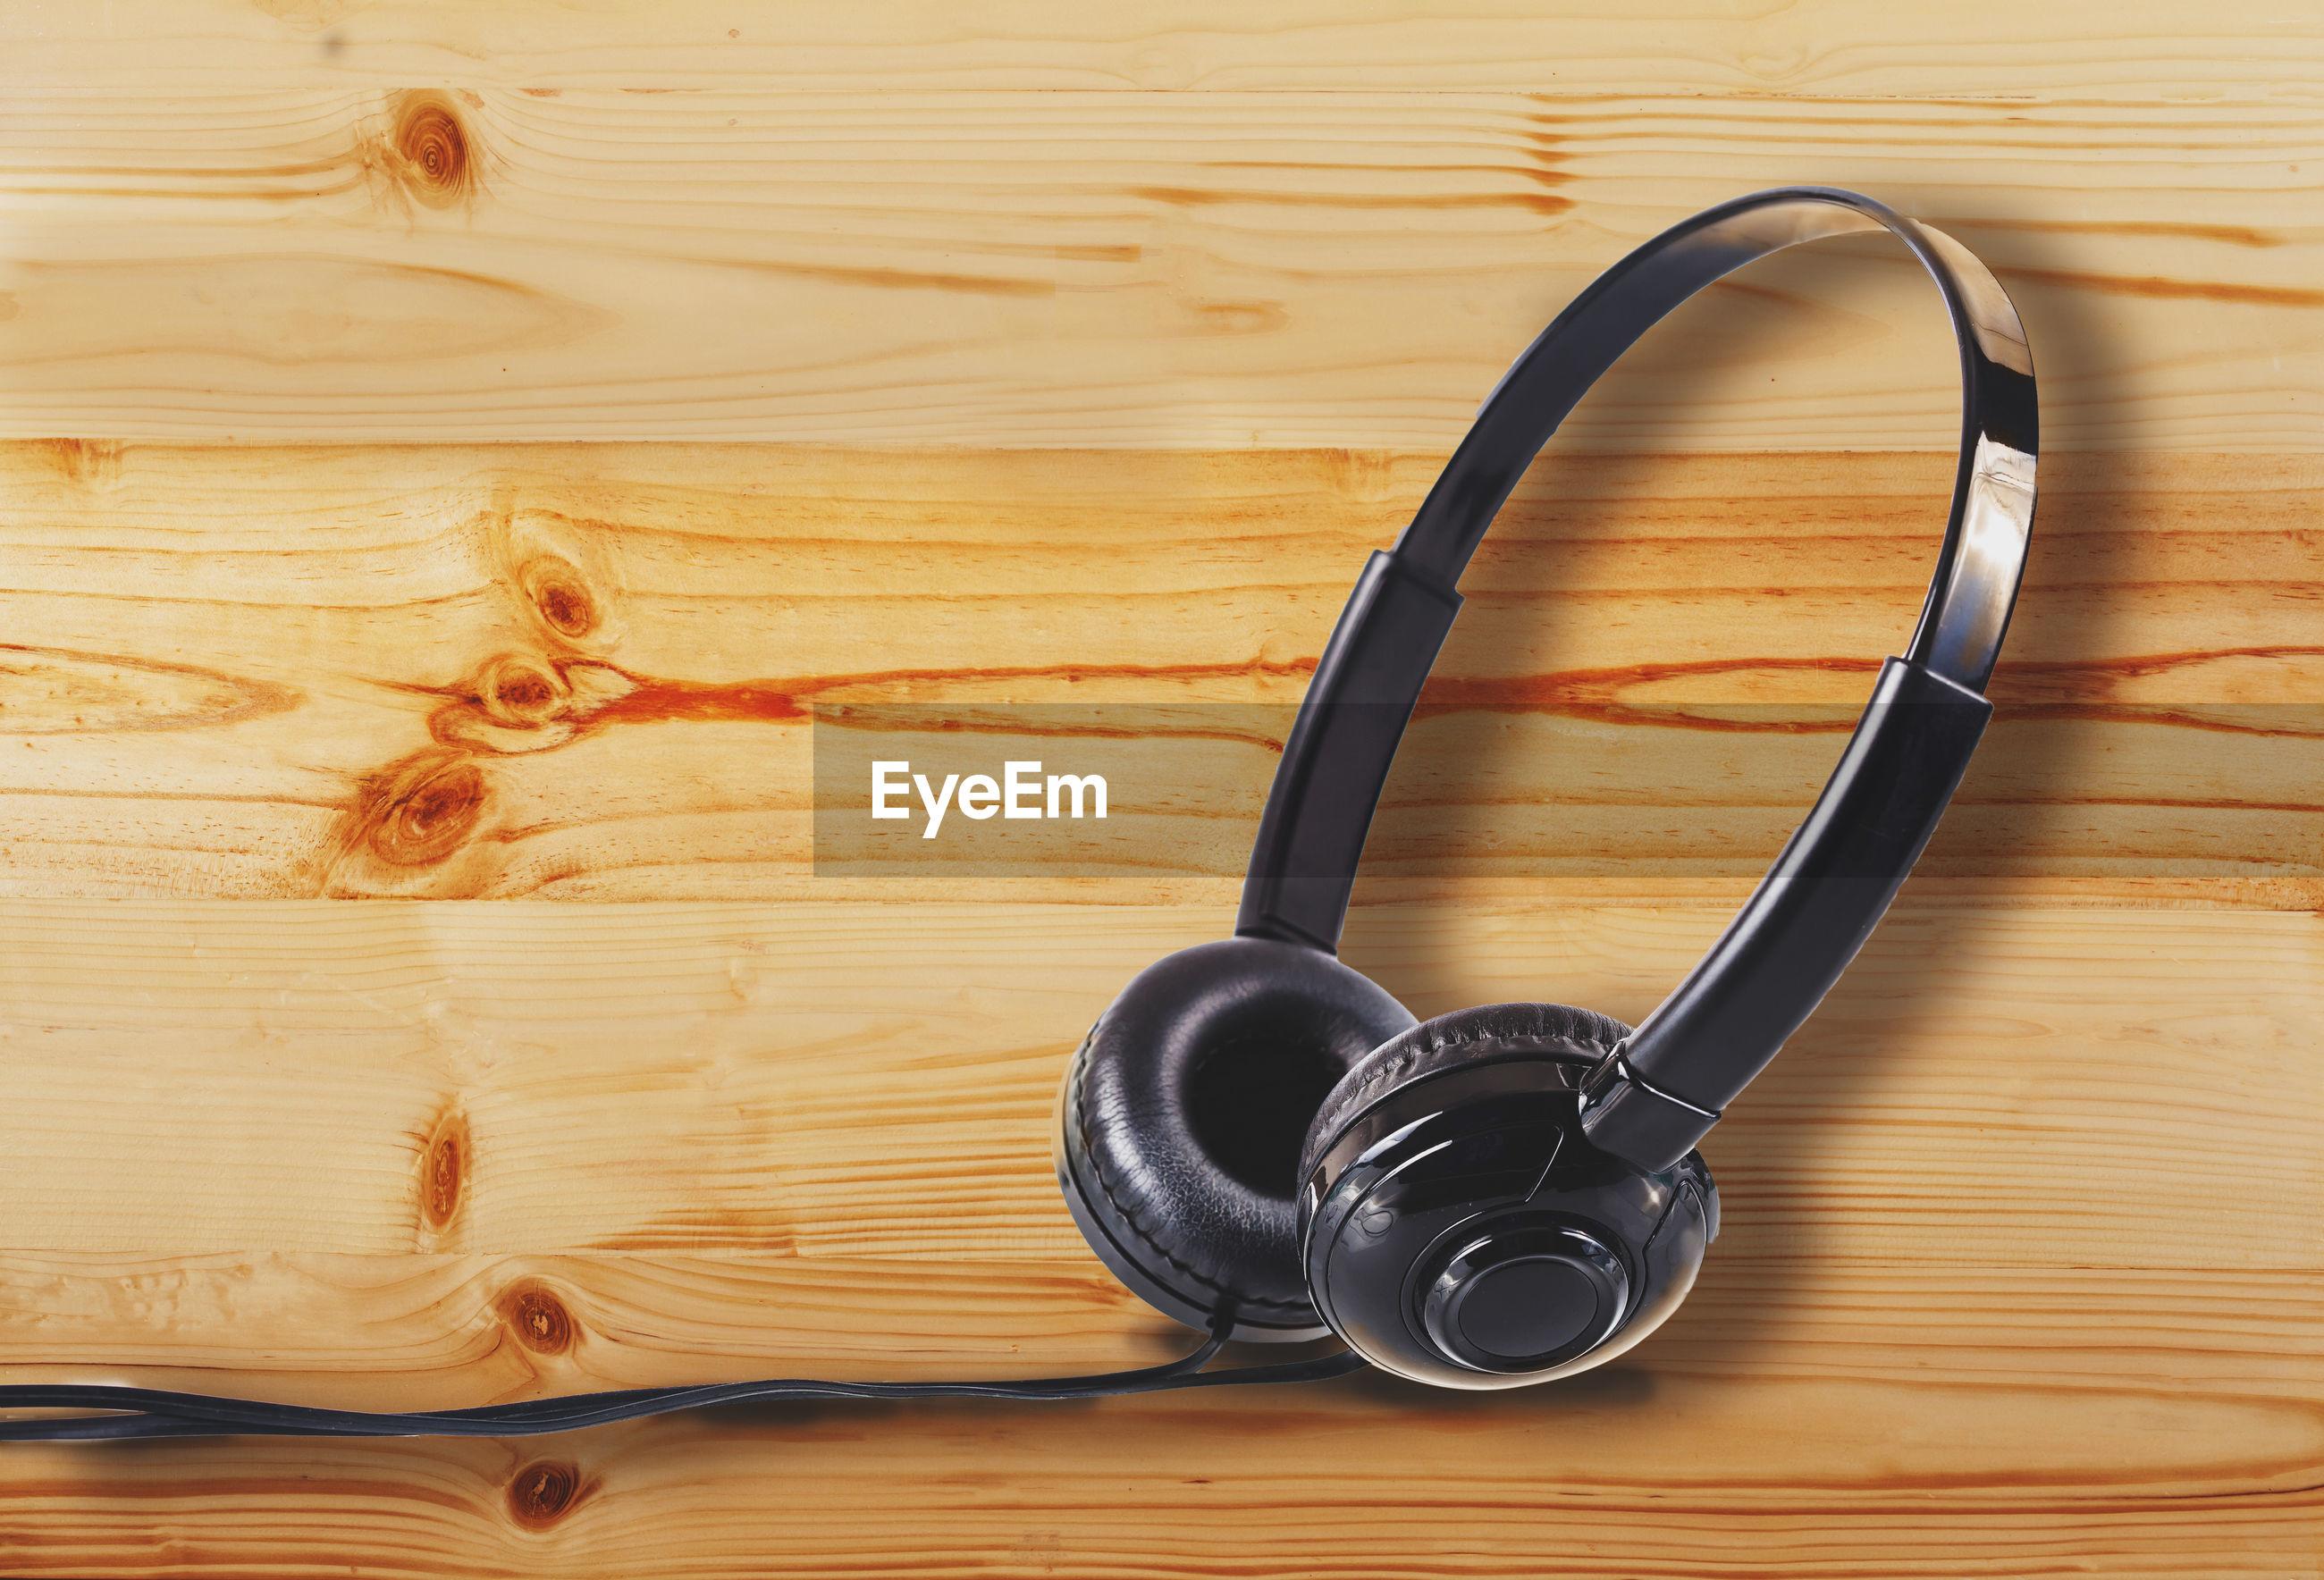 Headphones on wooden table